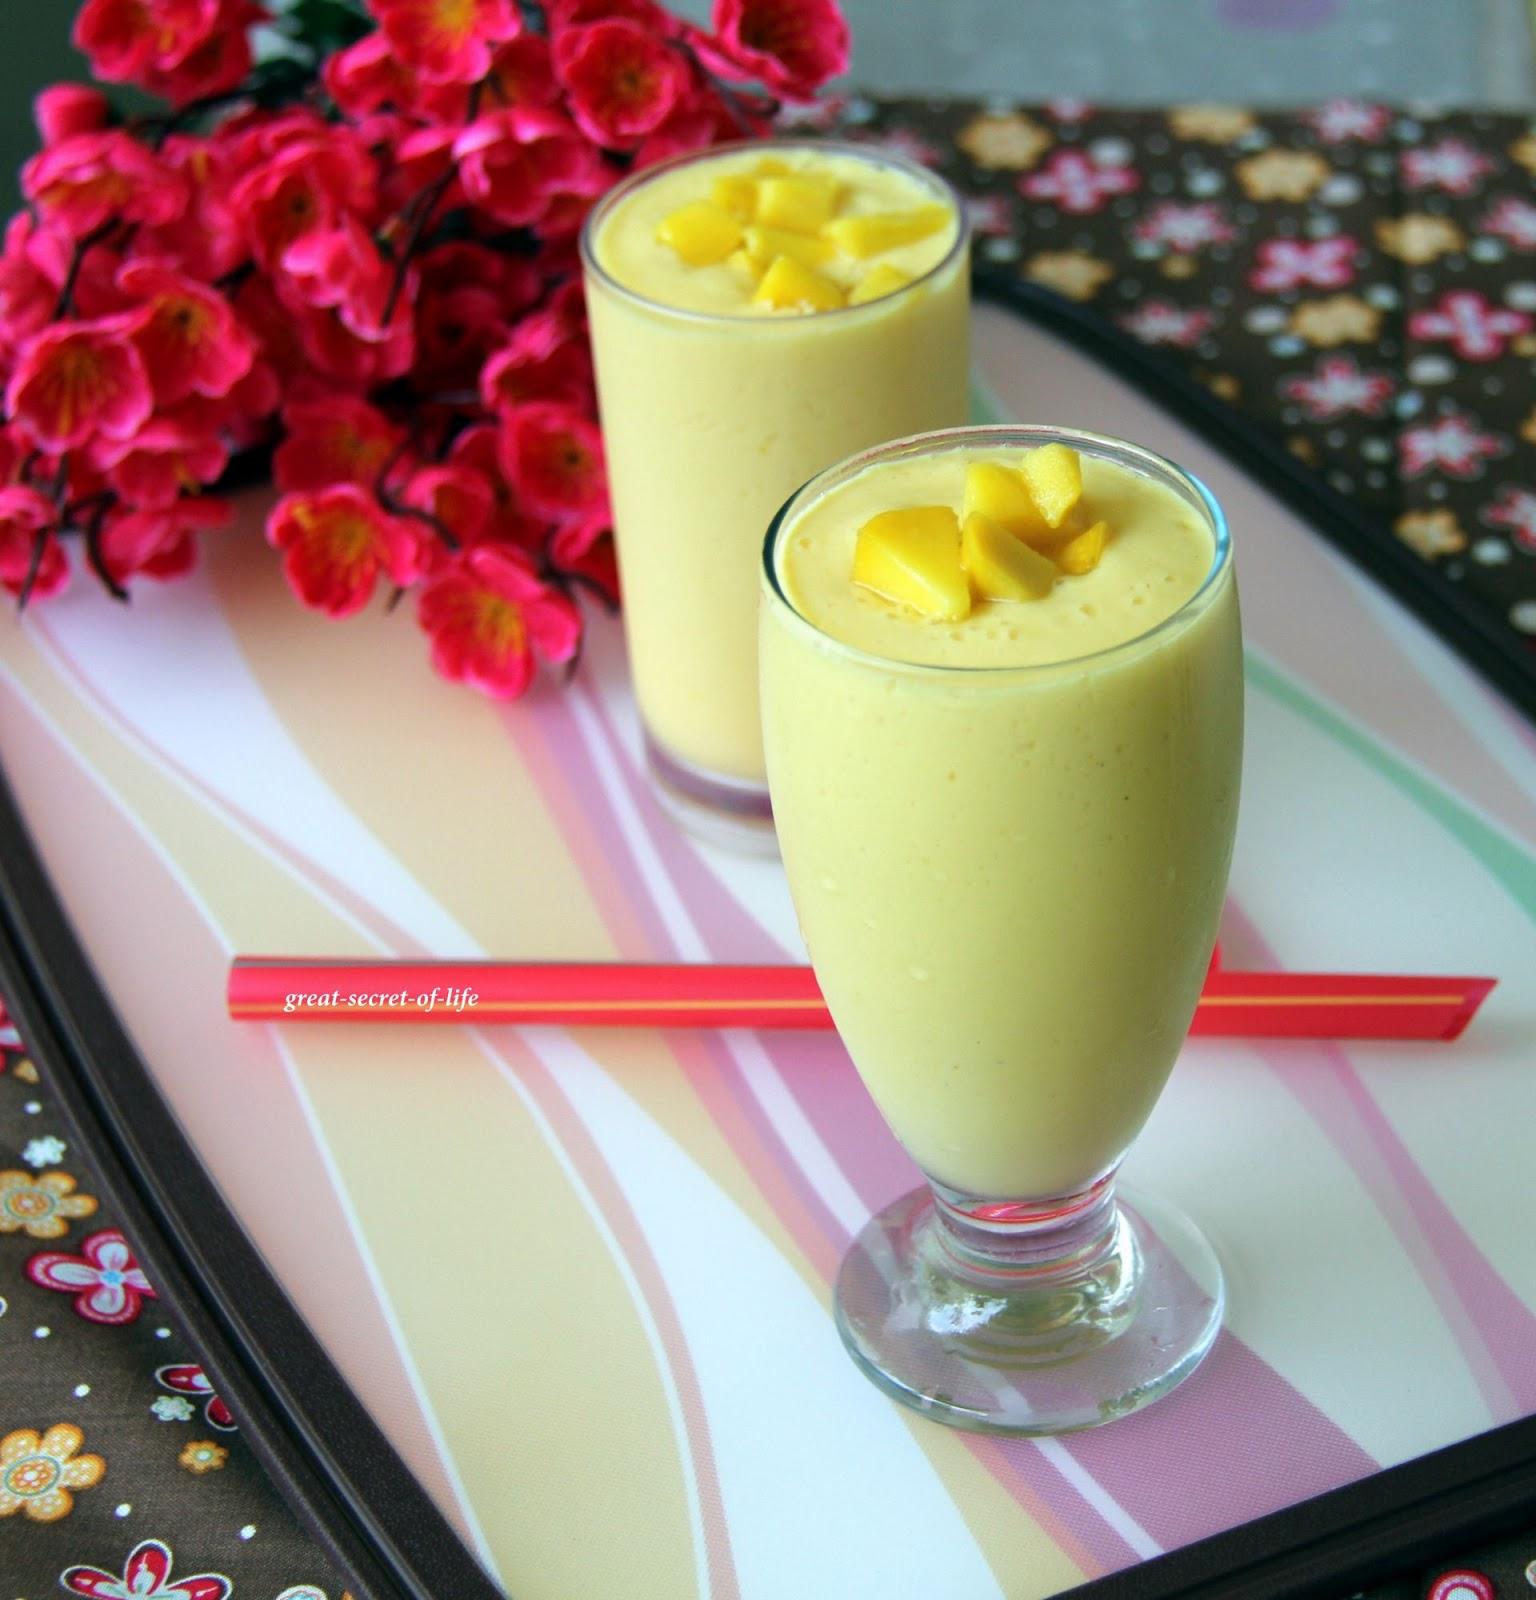 Mango Lassi - Mango Yogurt drink| Great-secret-of-life